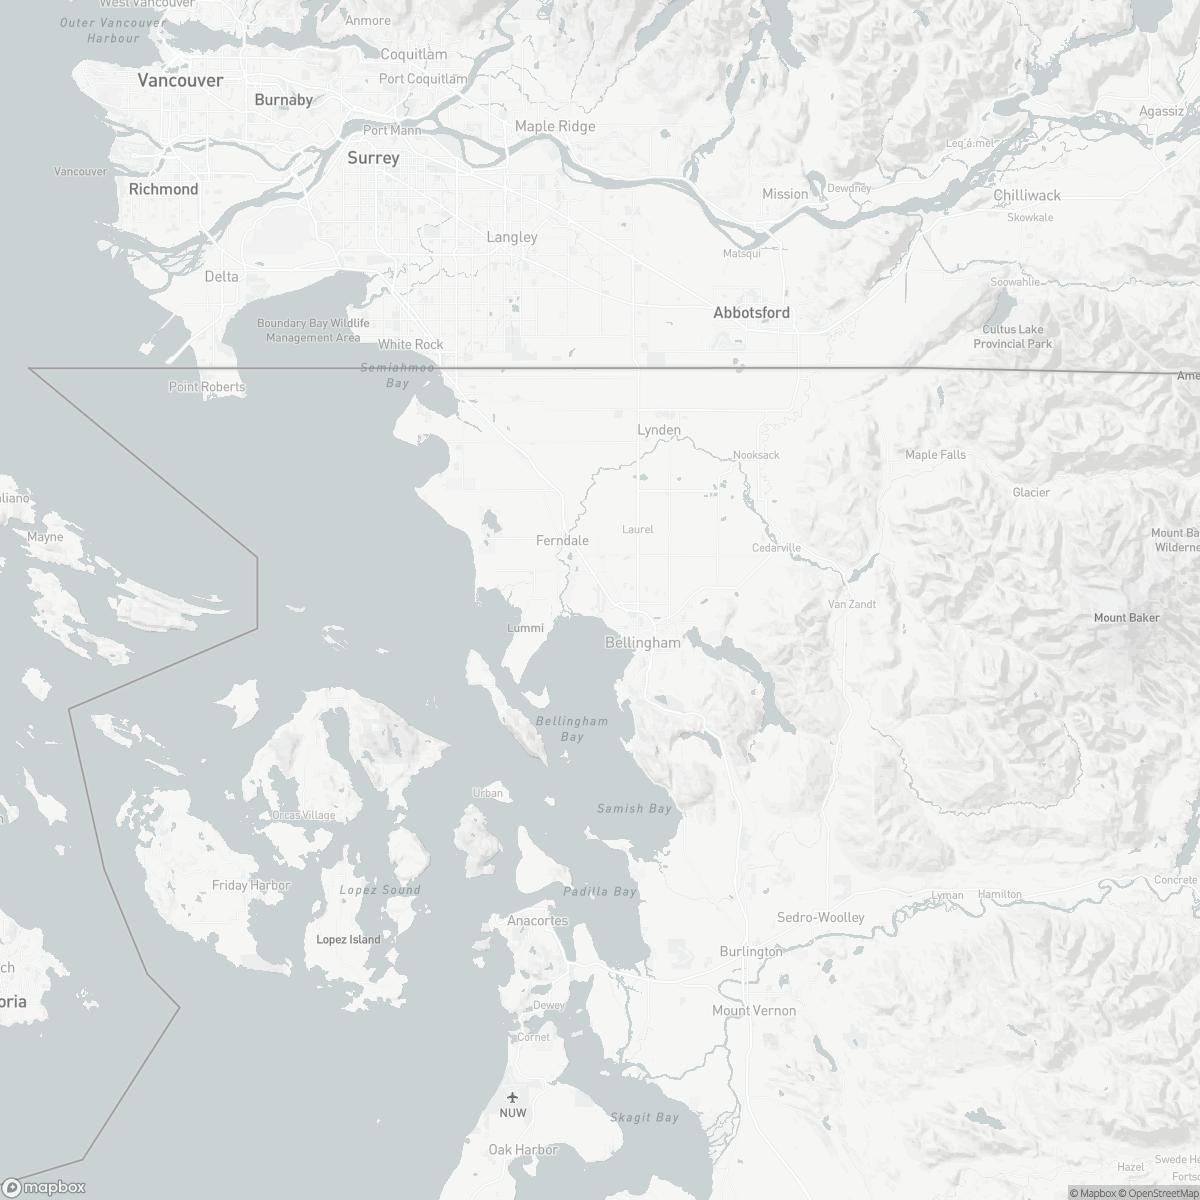 Map of Bellingham International Airport BLI surrounding area of Bellingham Washington